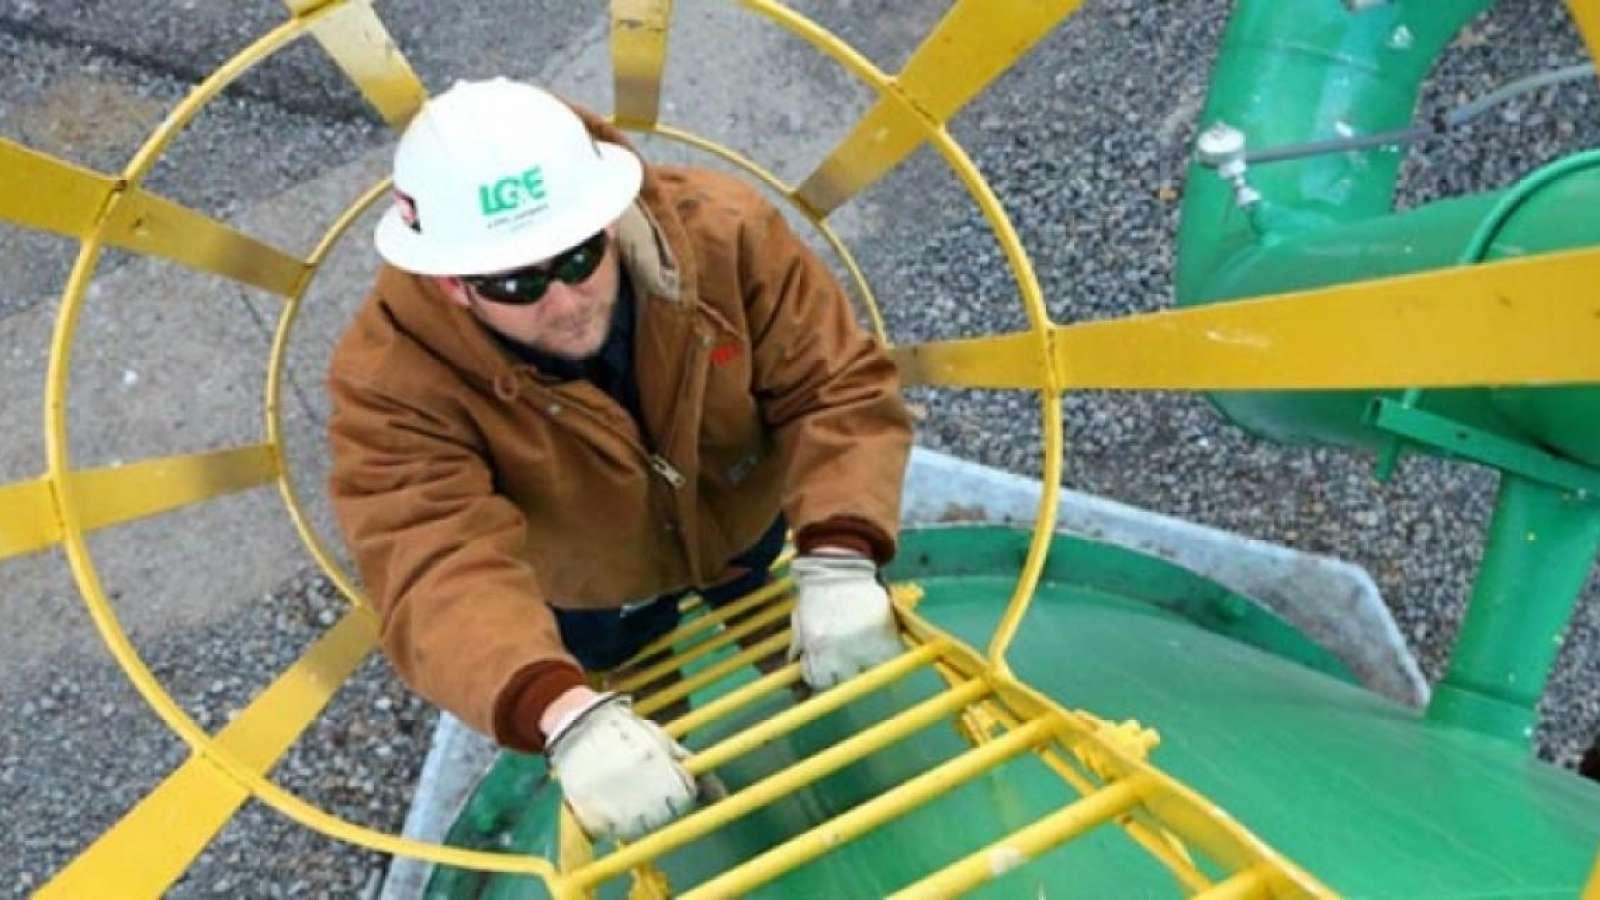 LG&E employee climbing up a safety ladder wearing hard hat